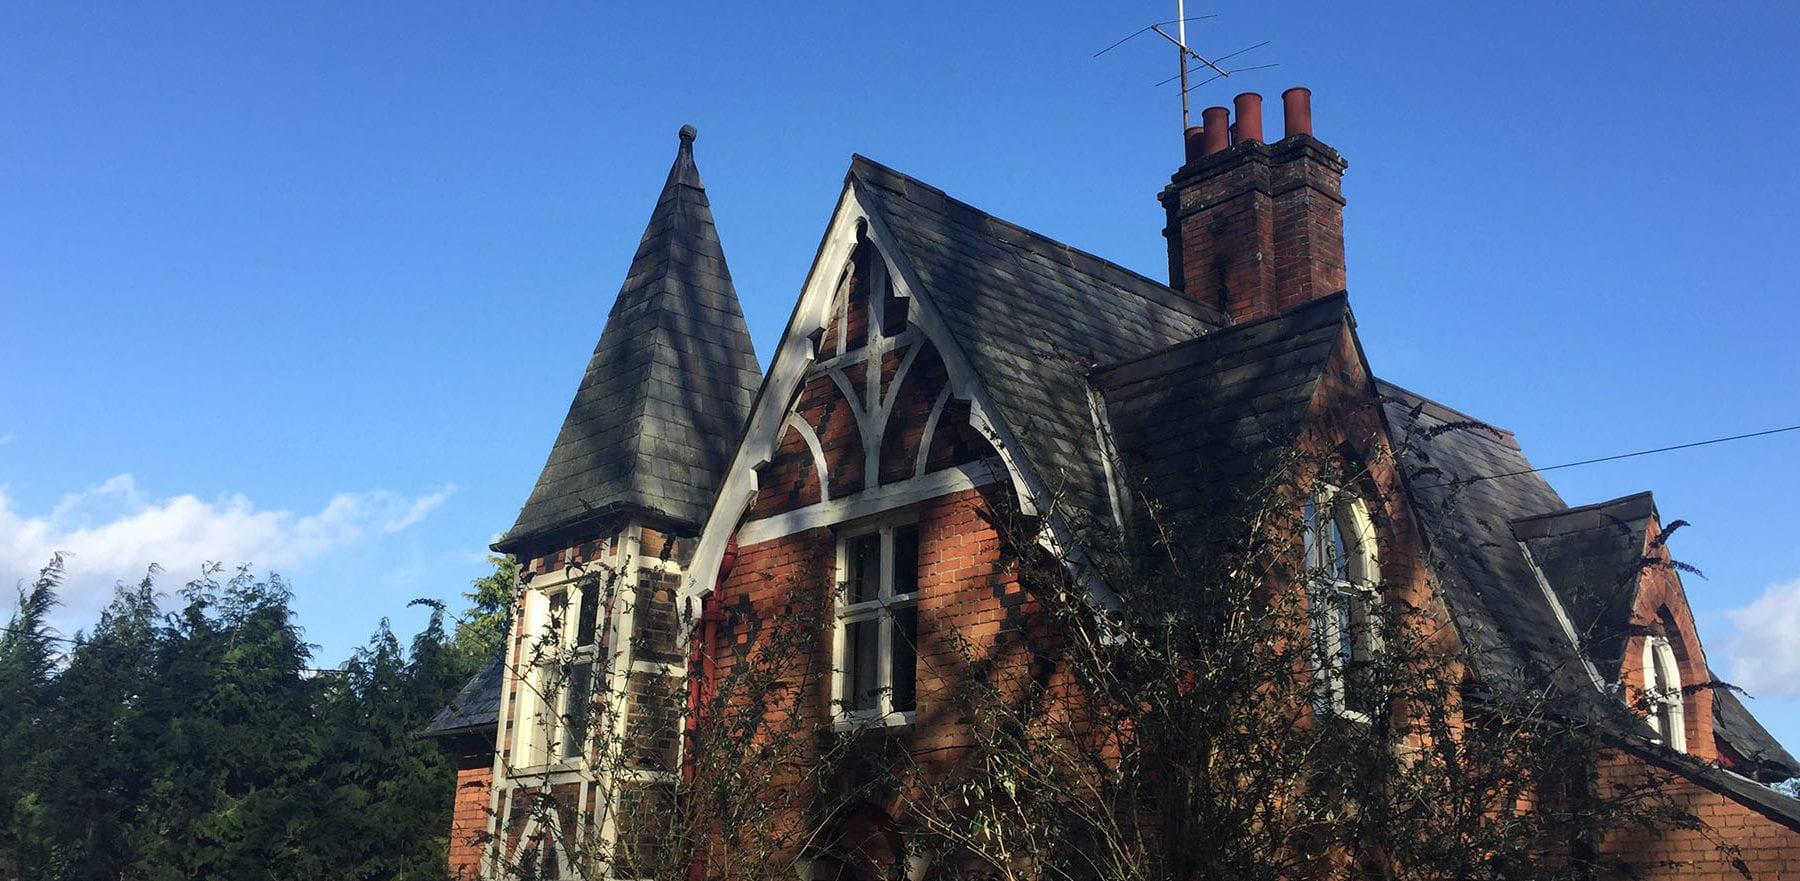 Lifestiles - Welsh Natural Slate Roof Tiles - Various, England 5